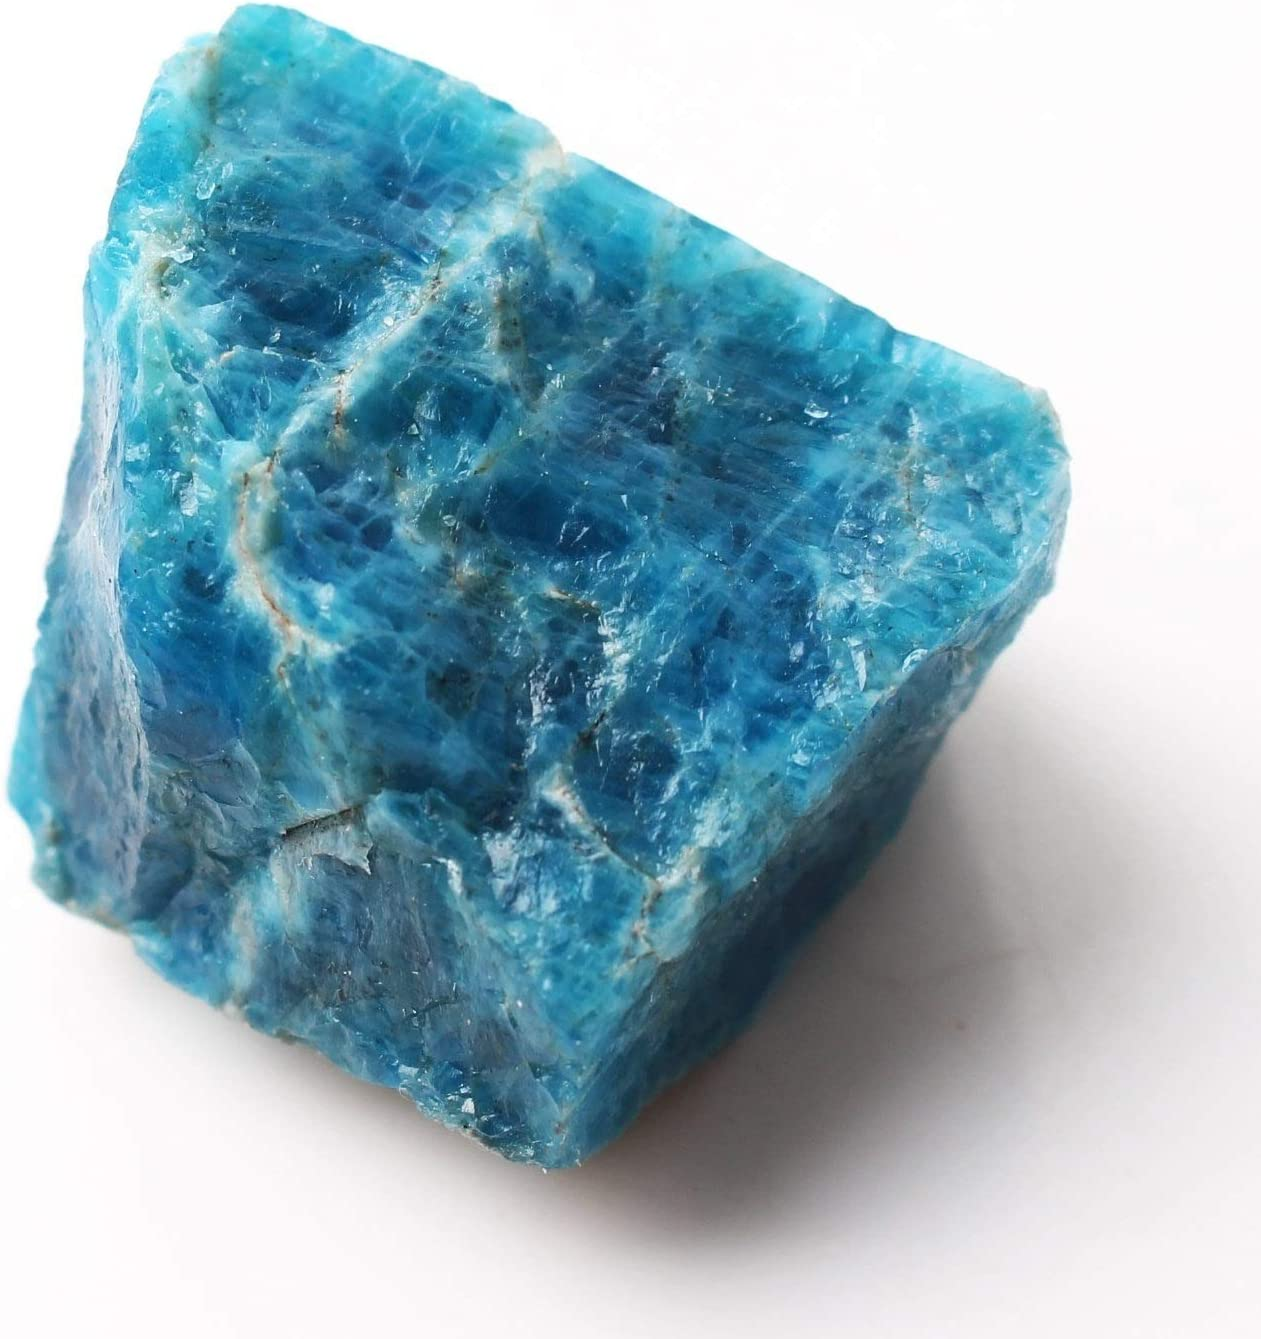 LUFEIAMZ Excellent 1PC Natural Apatite Daily bargain sale Crystal Gemstone Mi Rough Stone Raw